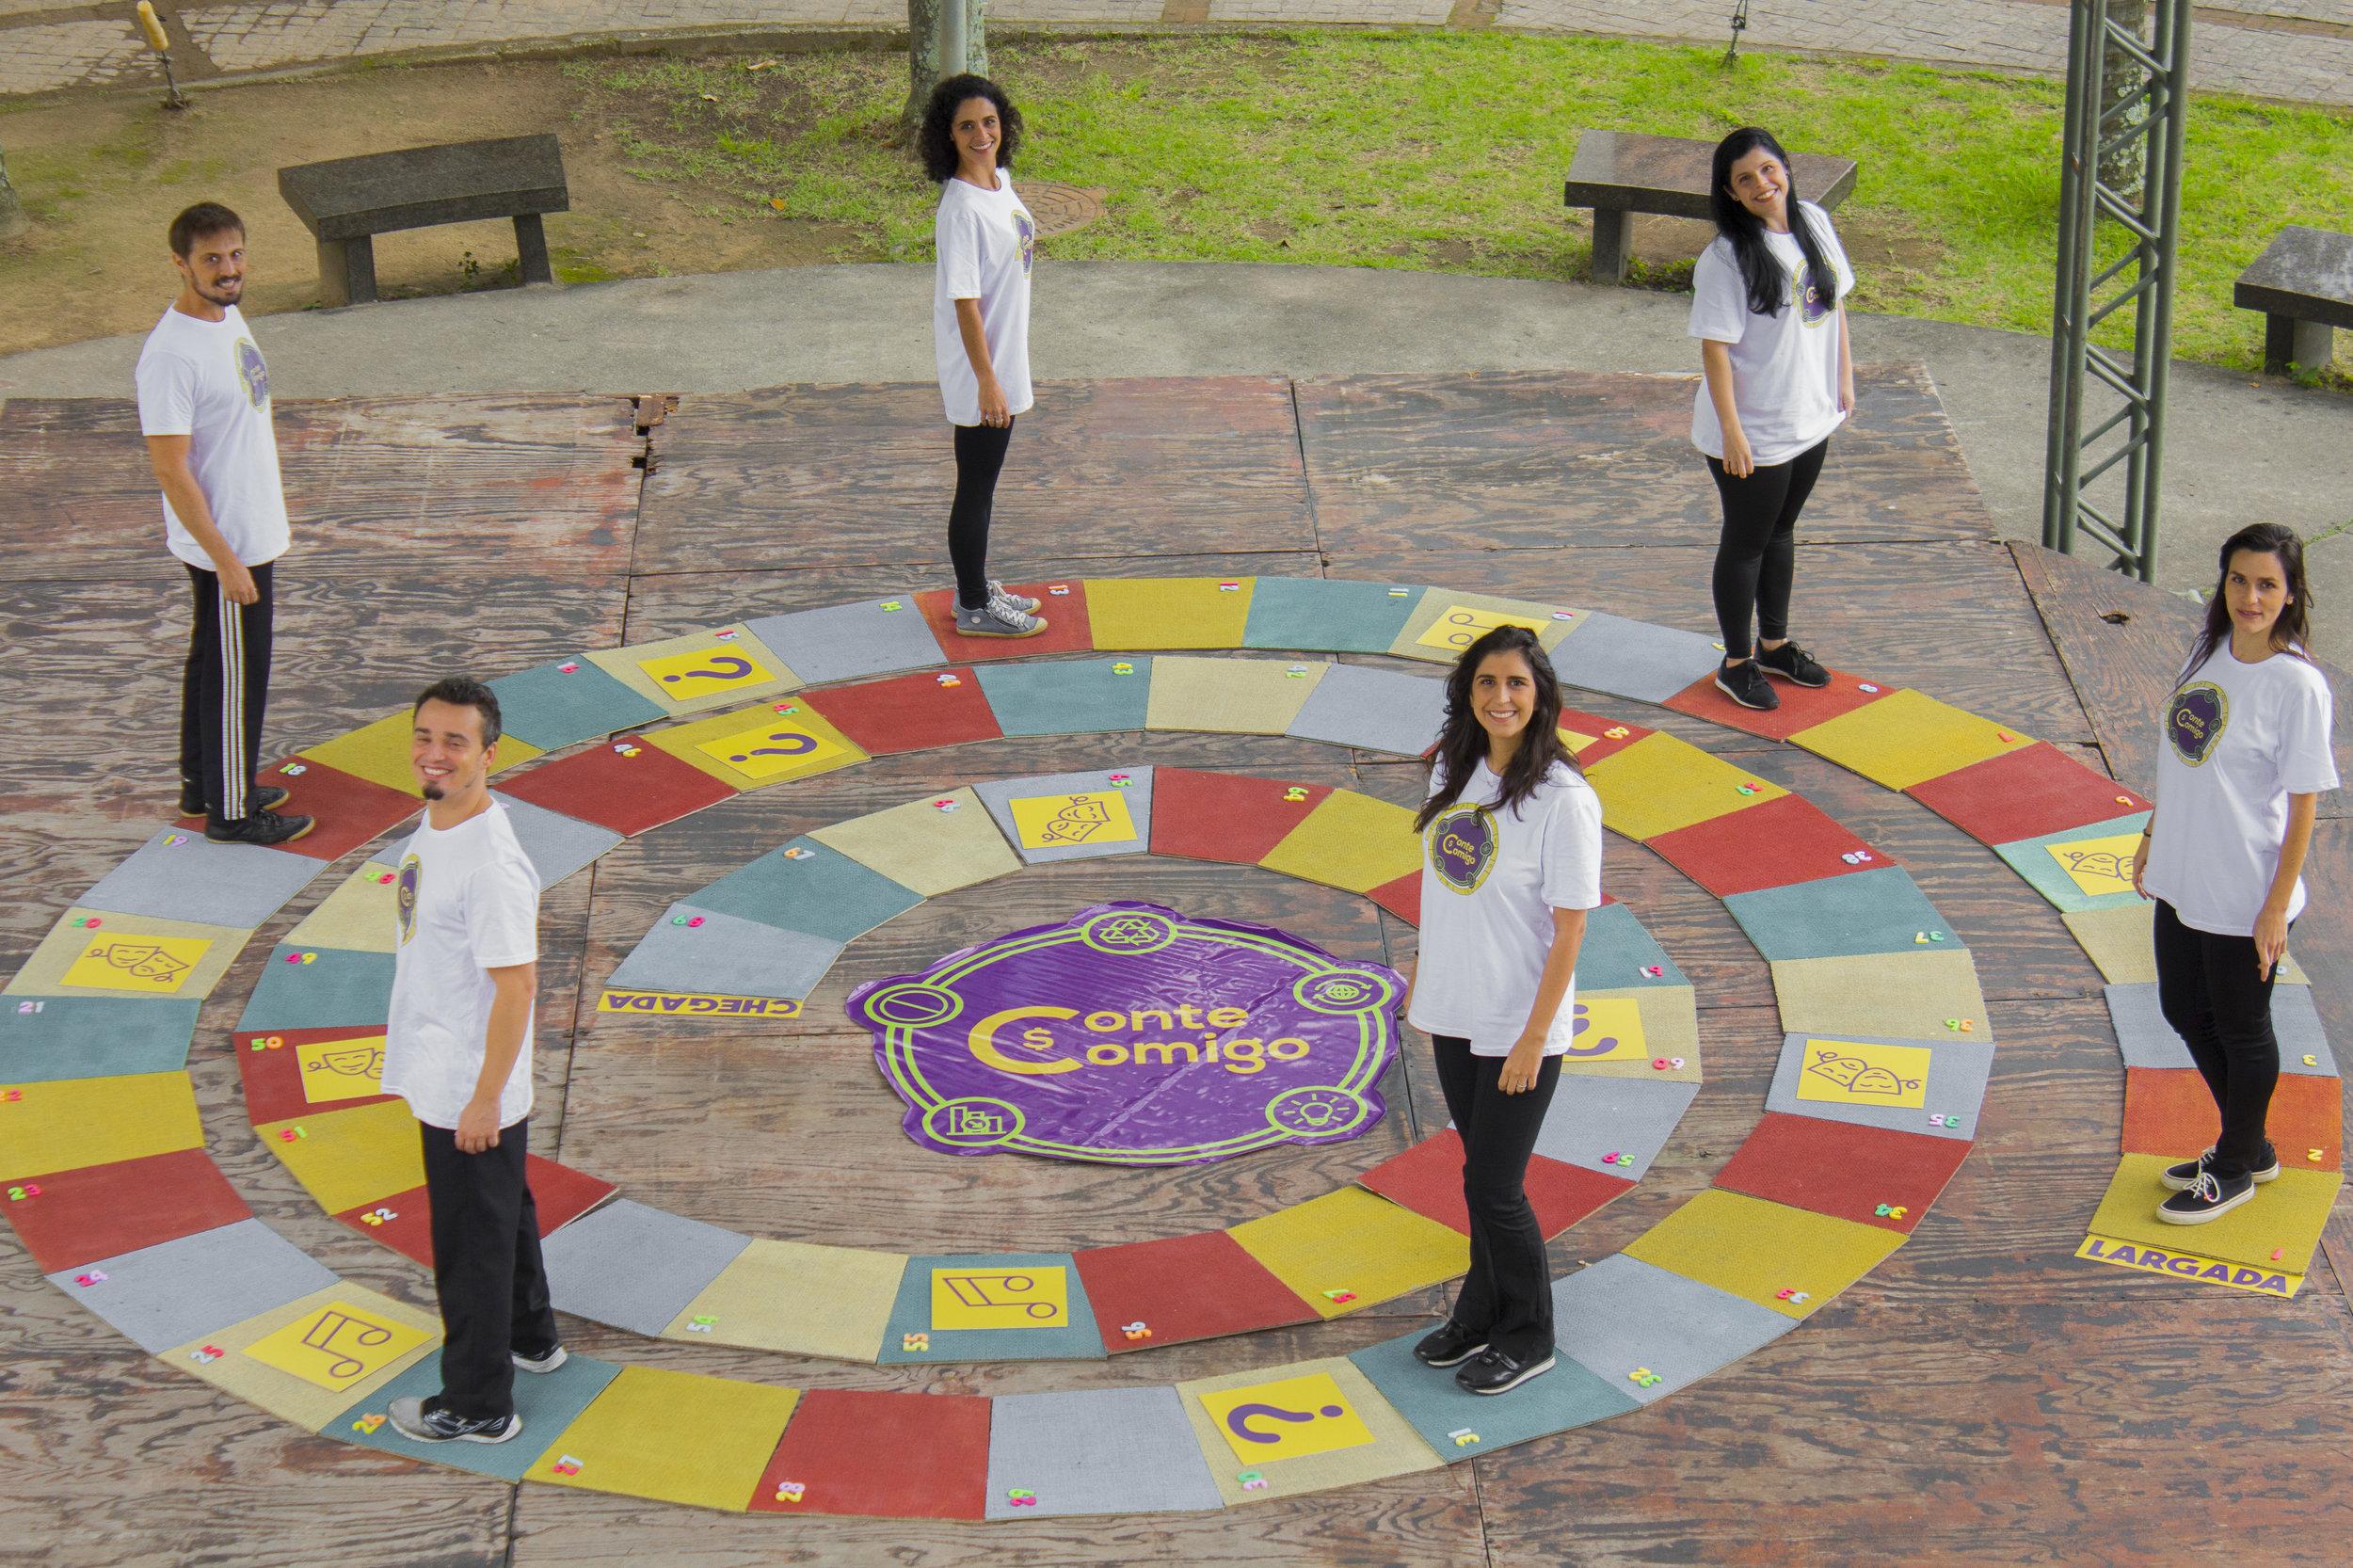 Conte Comigo! + Jogo de Tabuleiro - Espetáculo teatral sobre 5R's do Consumo Consciente + Jogo de Tabuleiro sobre tema abordado na peça. (120 min)